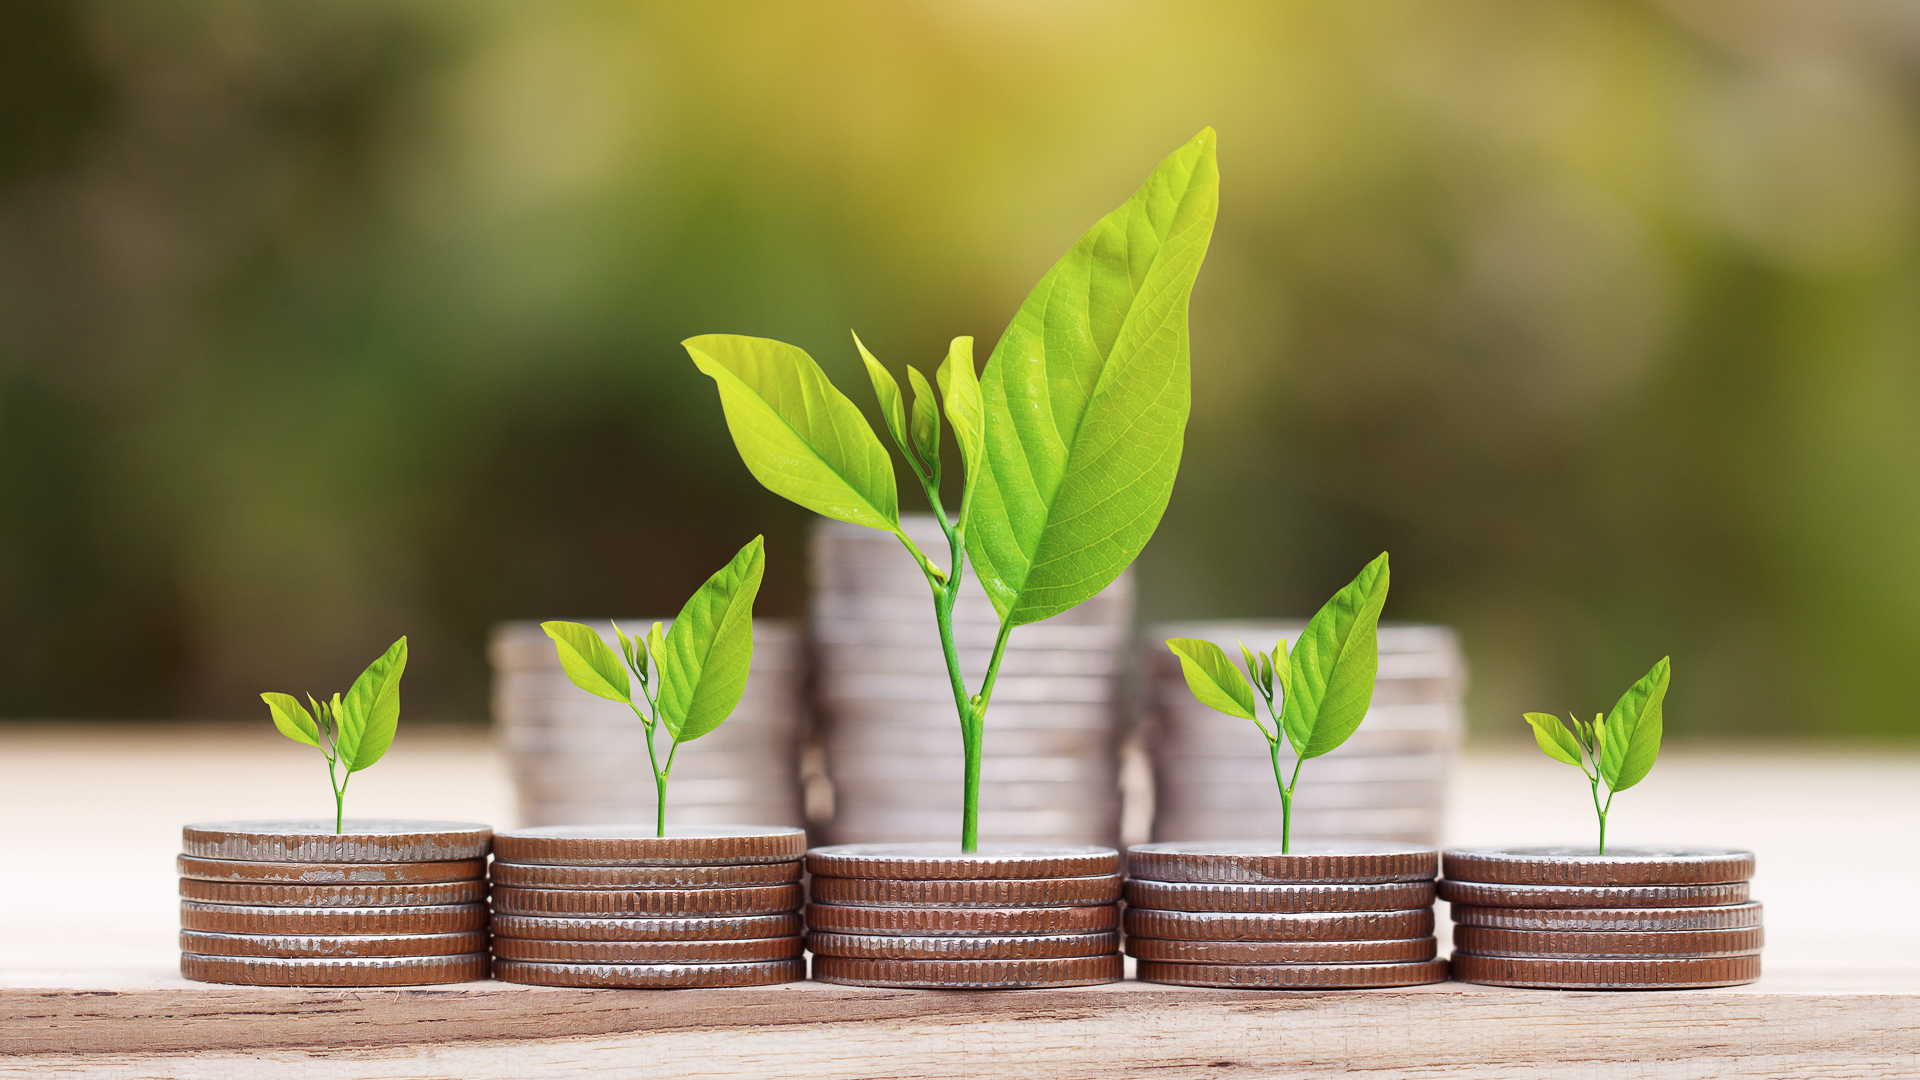 Các biện pháp bảo đảm đầu tư